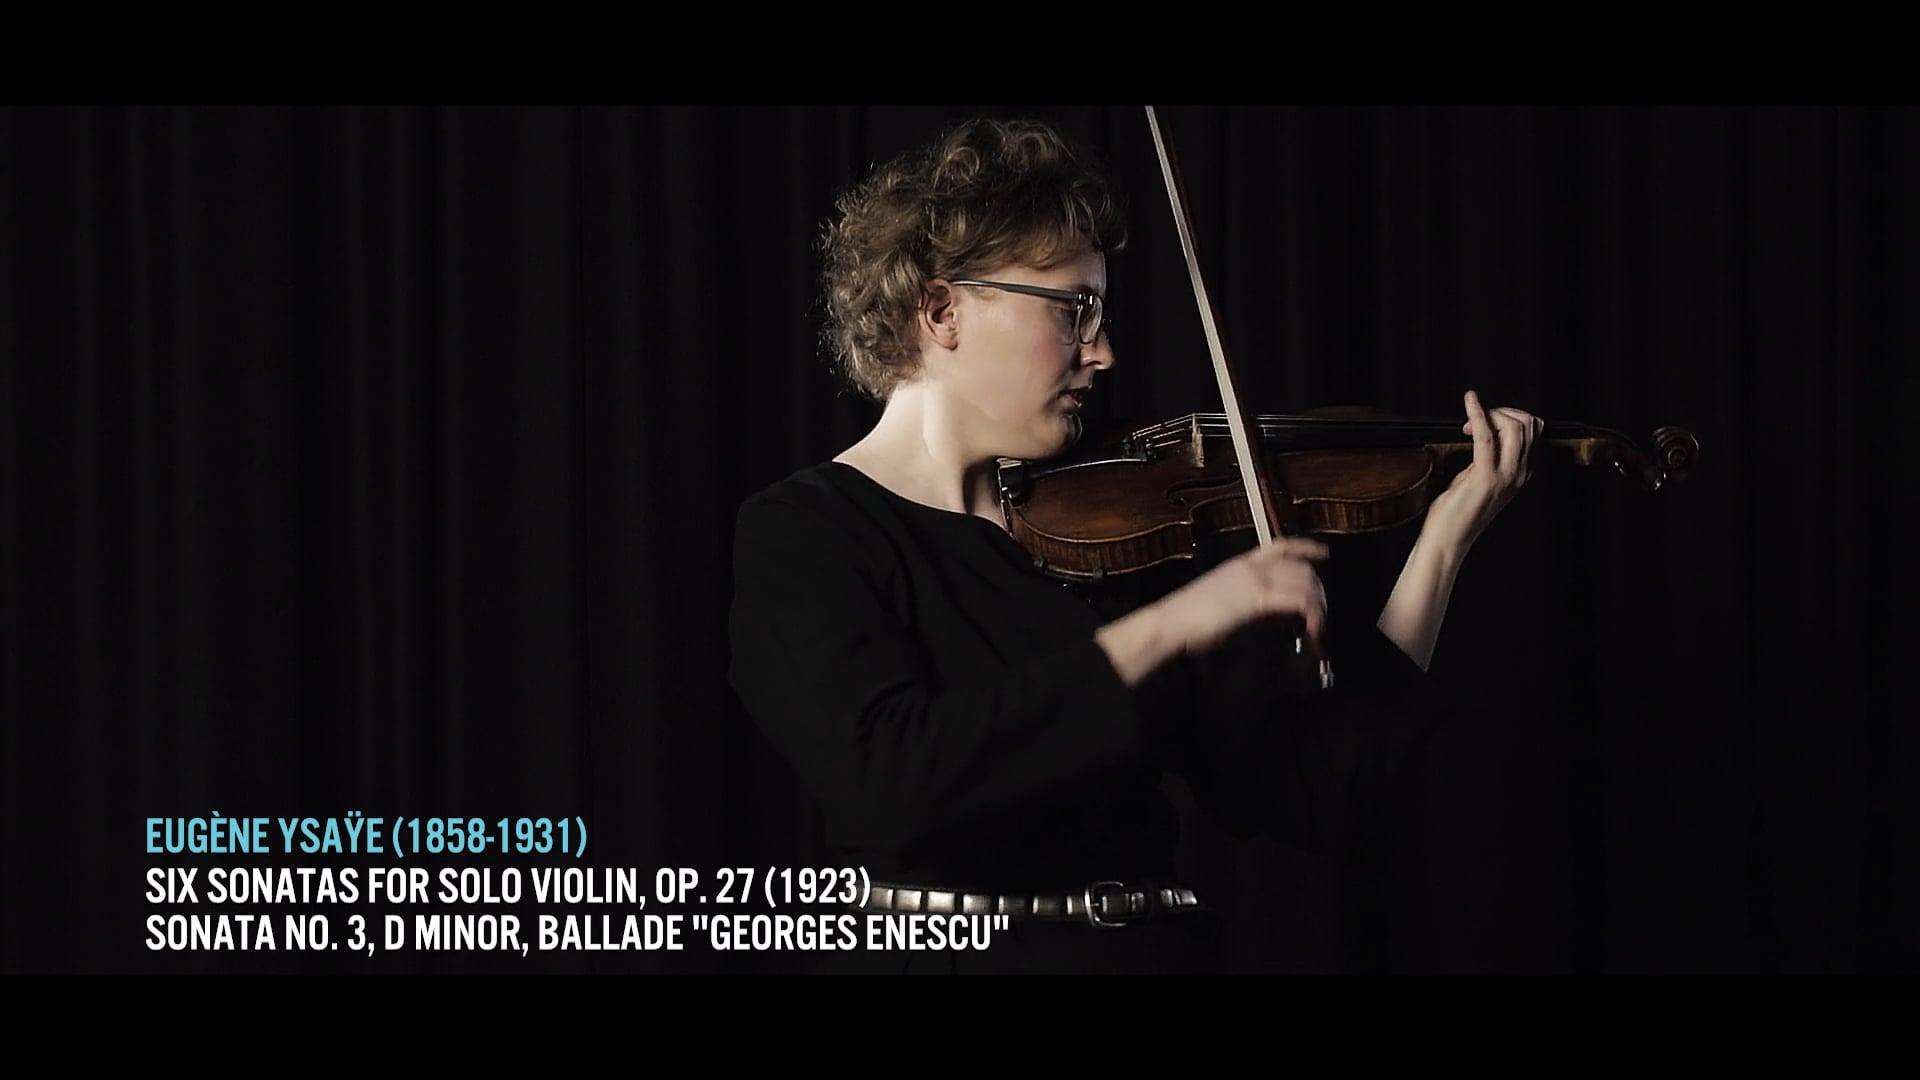 Léonie Sonning Talent Prizes 2019 – Christine Bernsted plays Eugène Ysaÿe Sonata No. 3 in D Minor